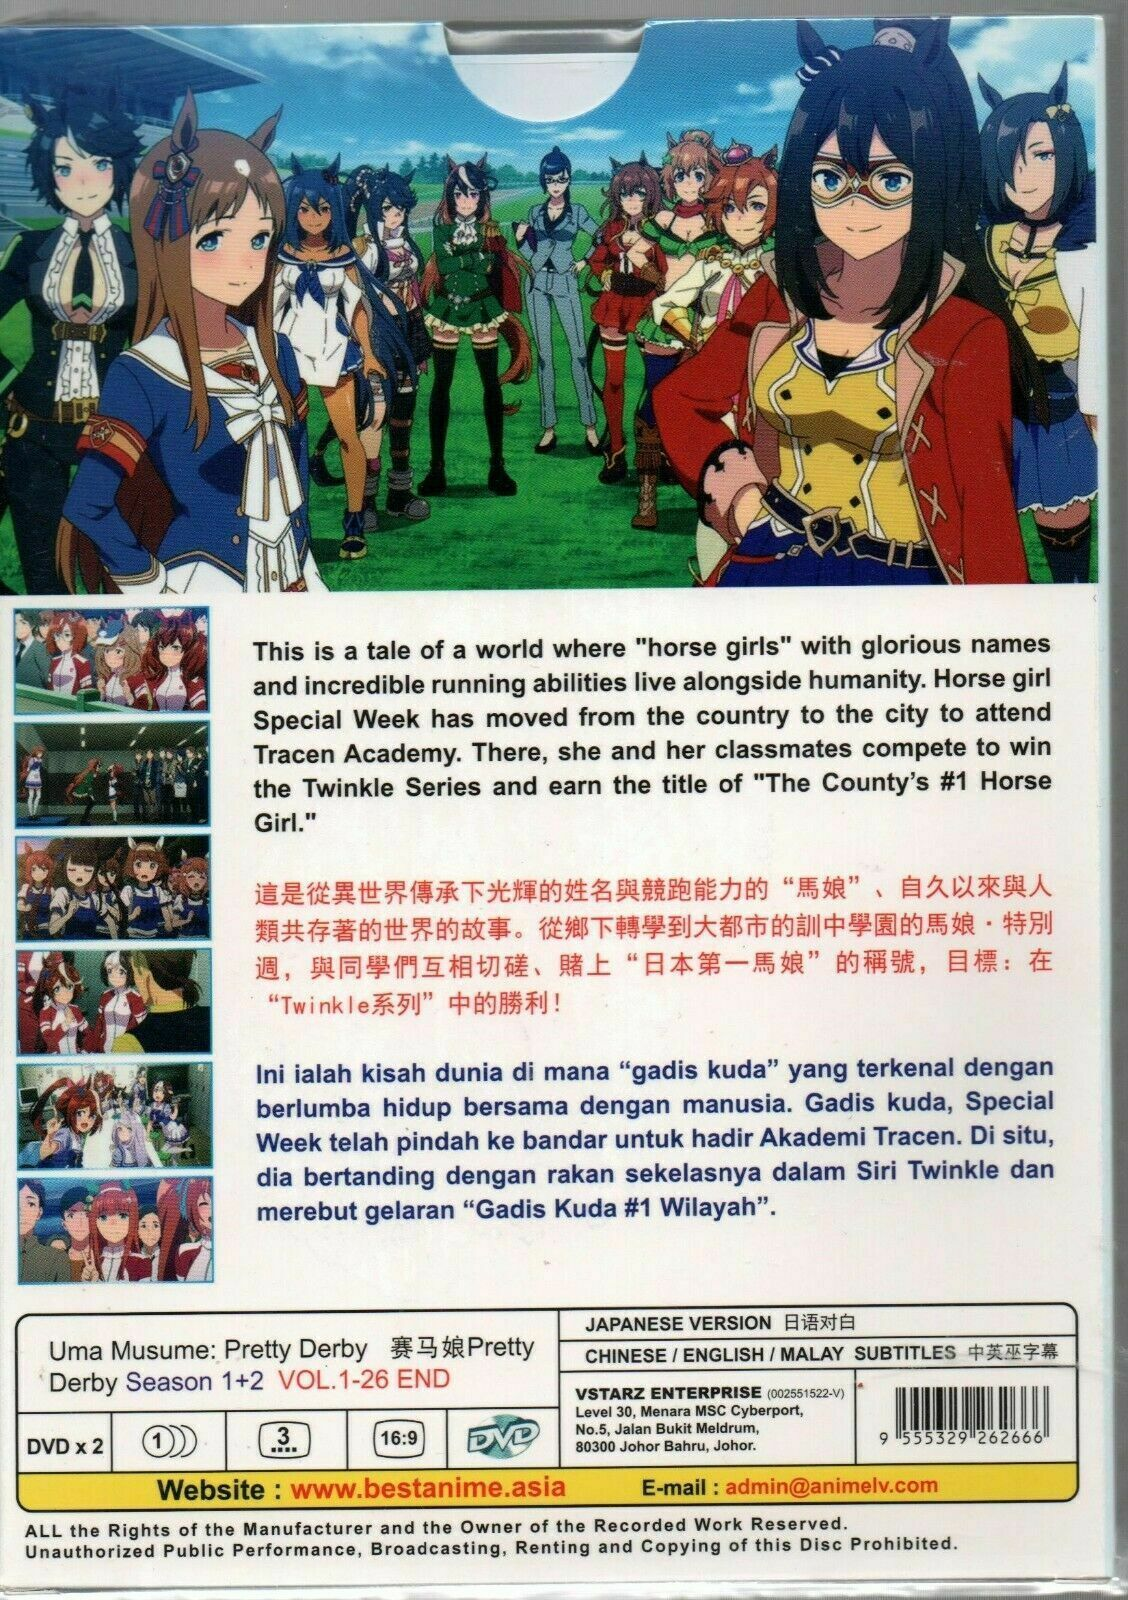 Uma Musume: Pretty Derby Season 1+2 Vol.1-26 End English Subtitle Ship From USA